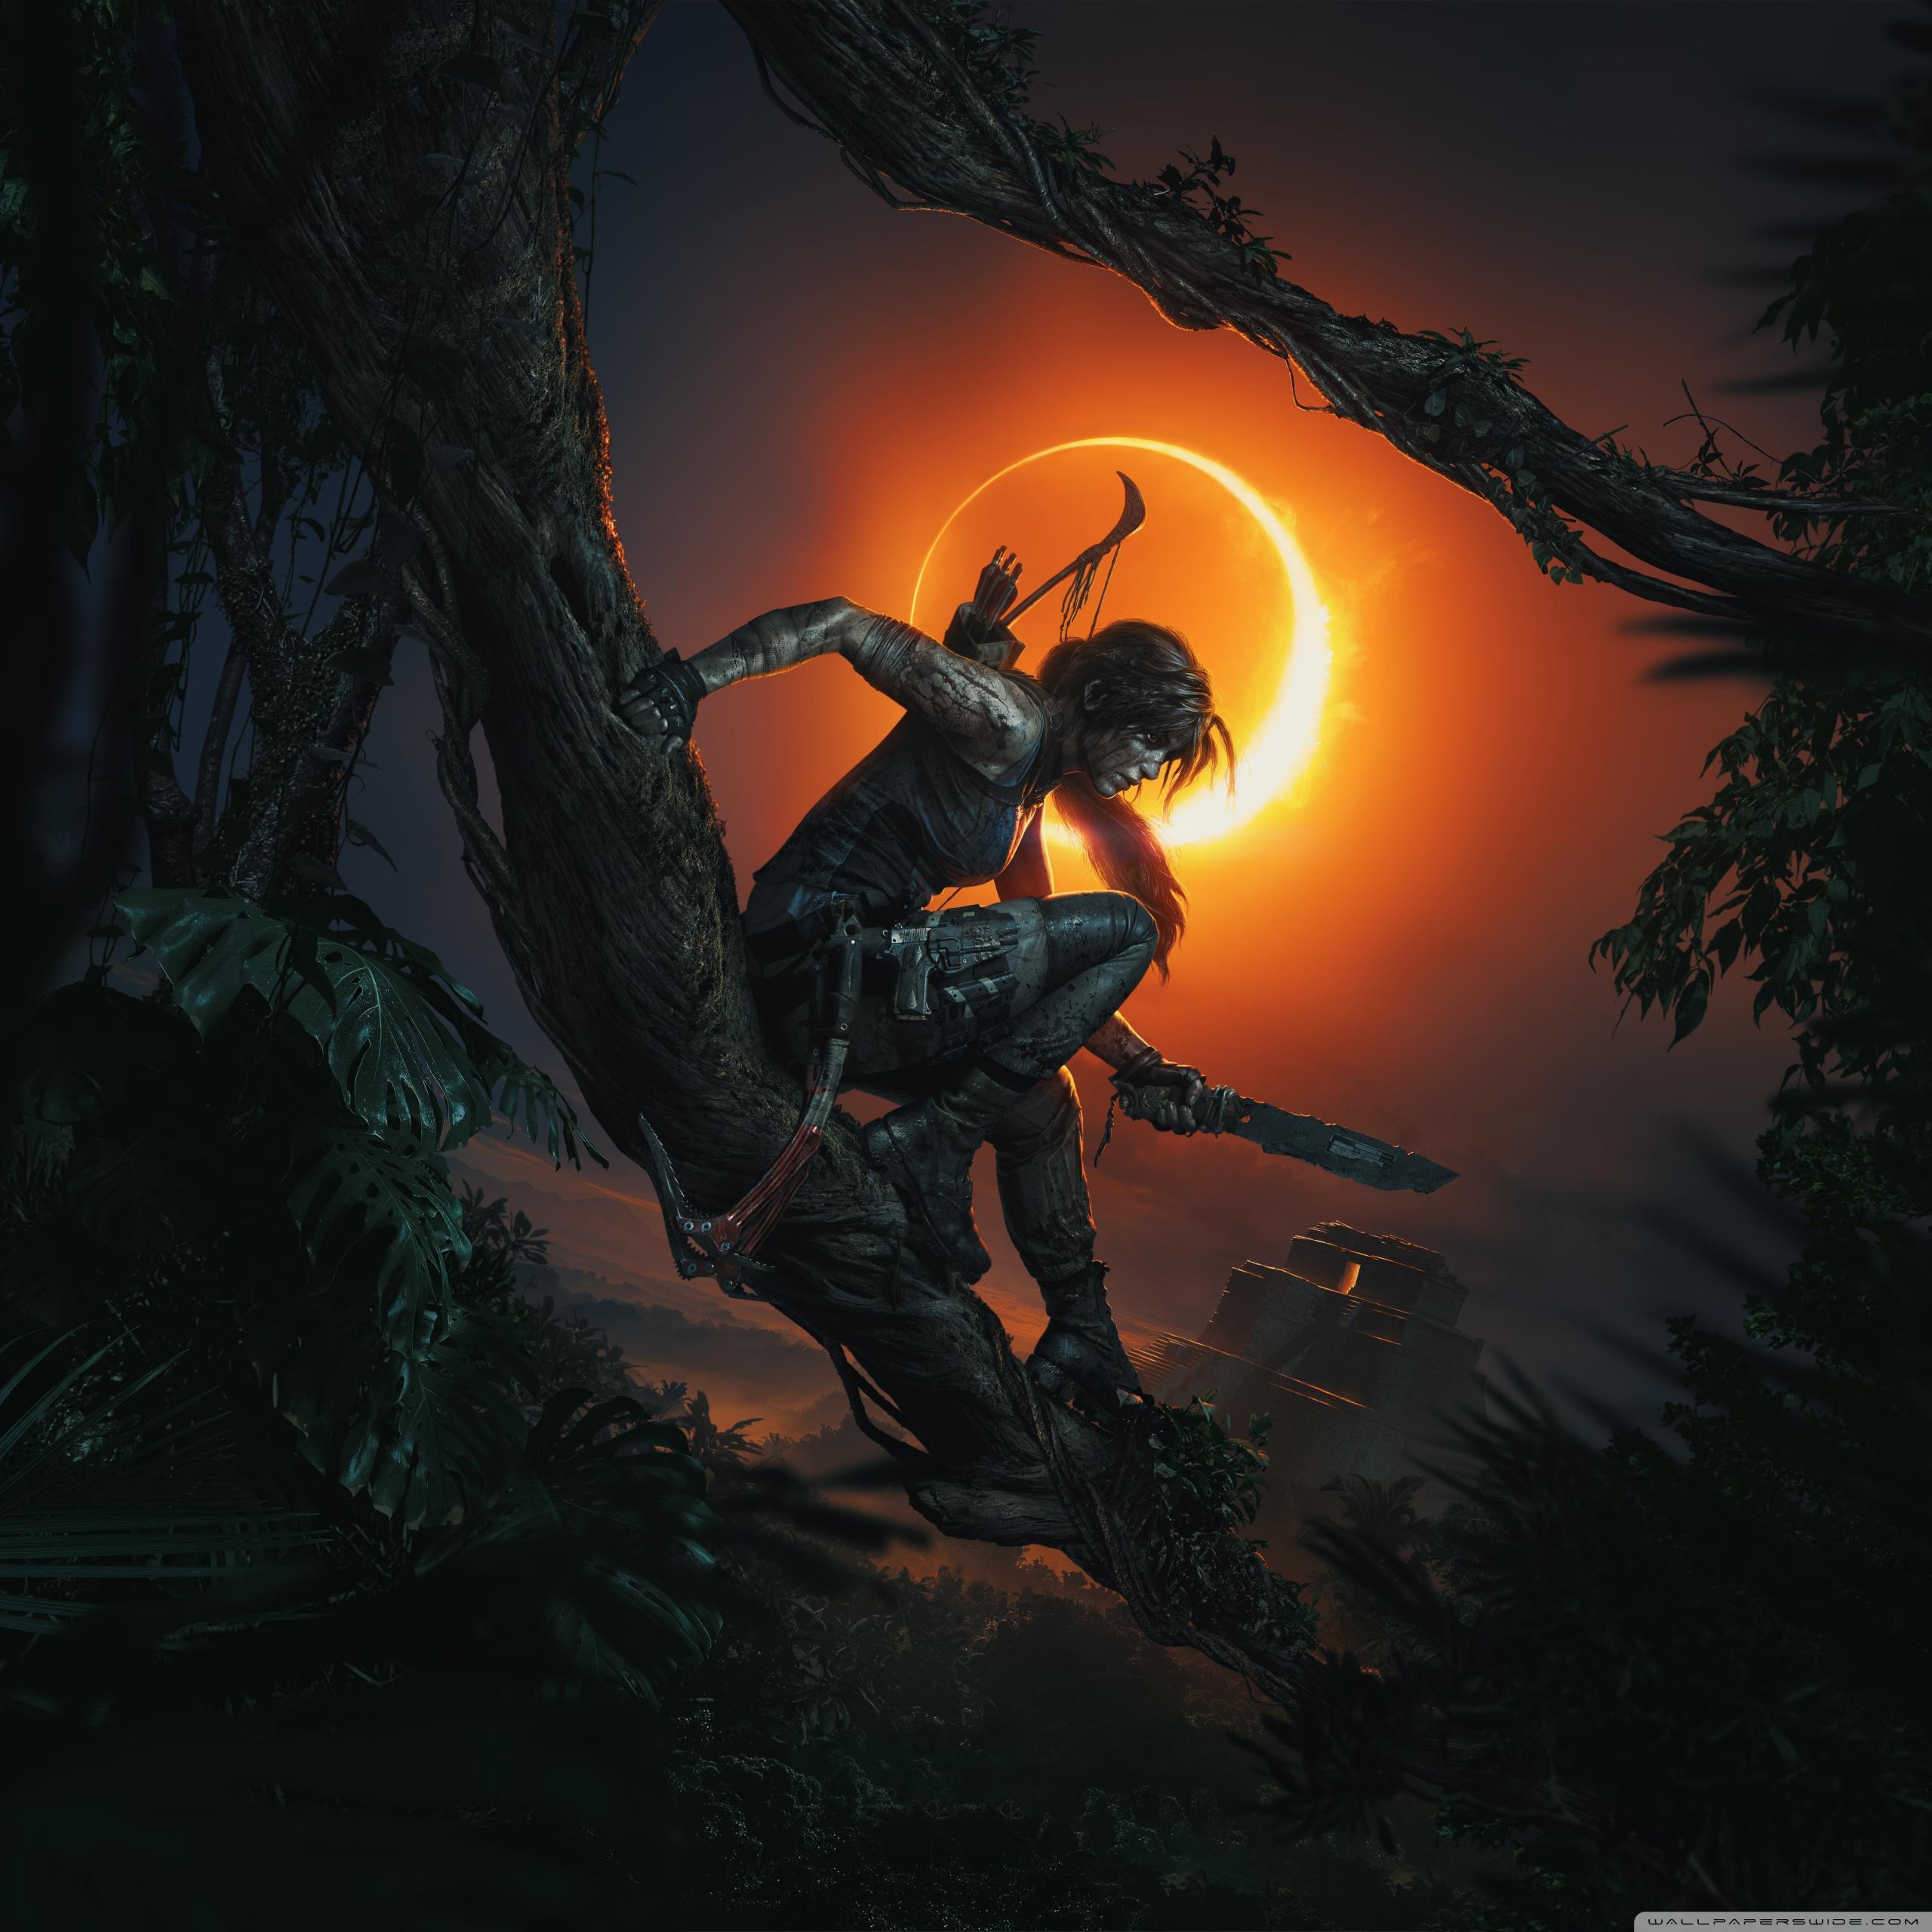 Tomb Raider Desktop Wallpaper: Shadow Of The Tomb Raider 2018 Puzzle Video Game 4K HD